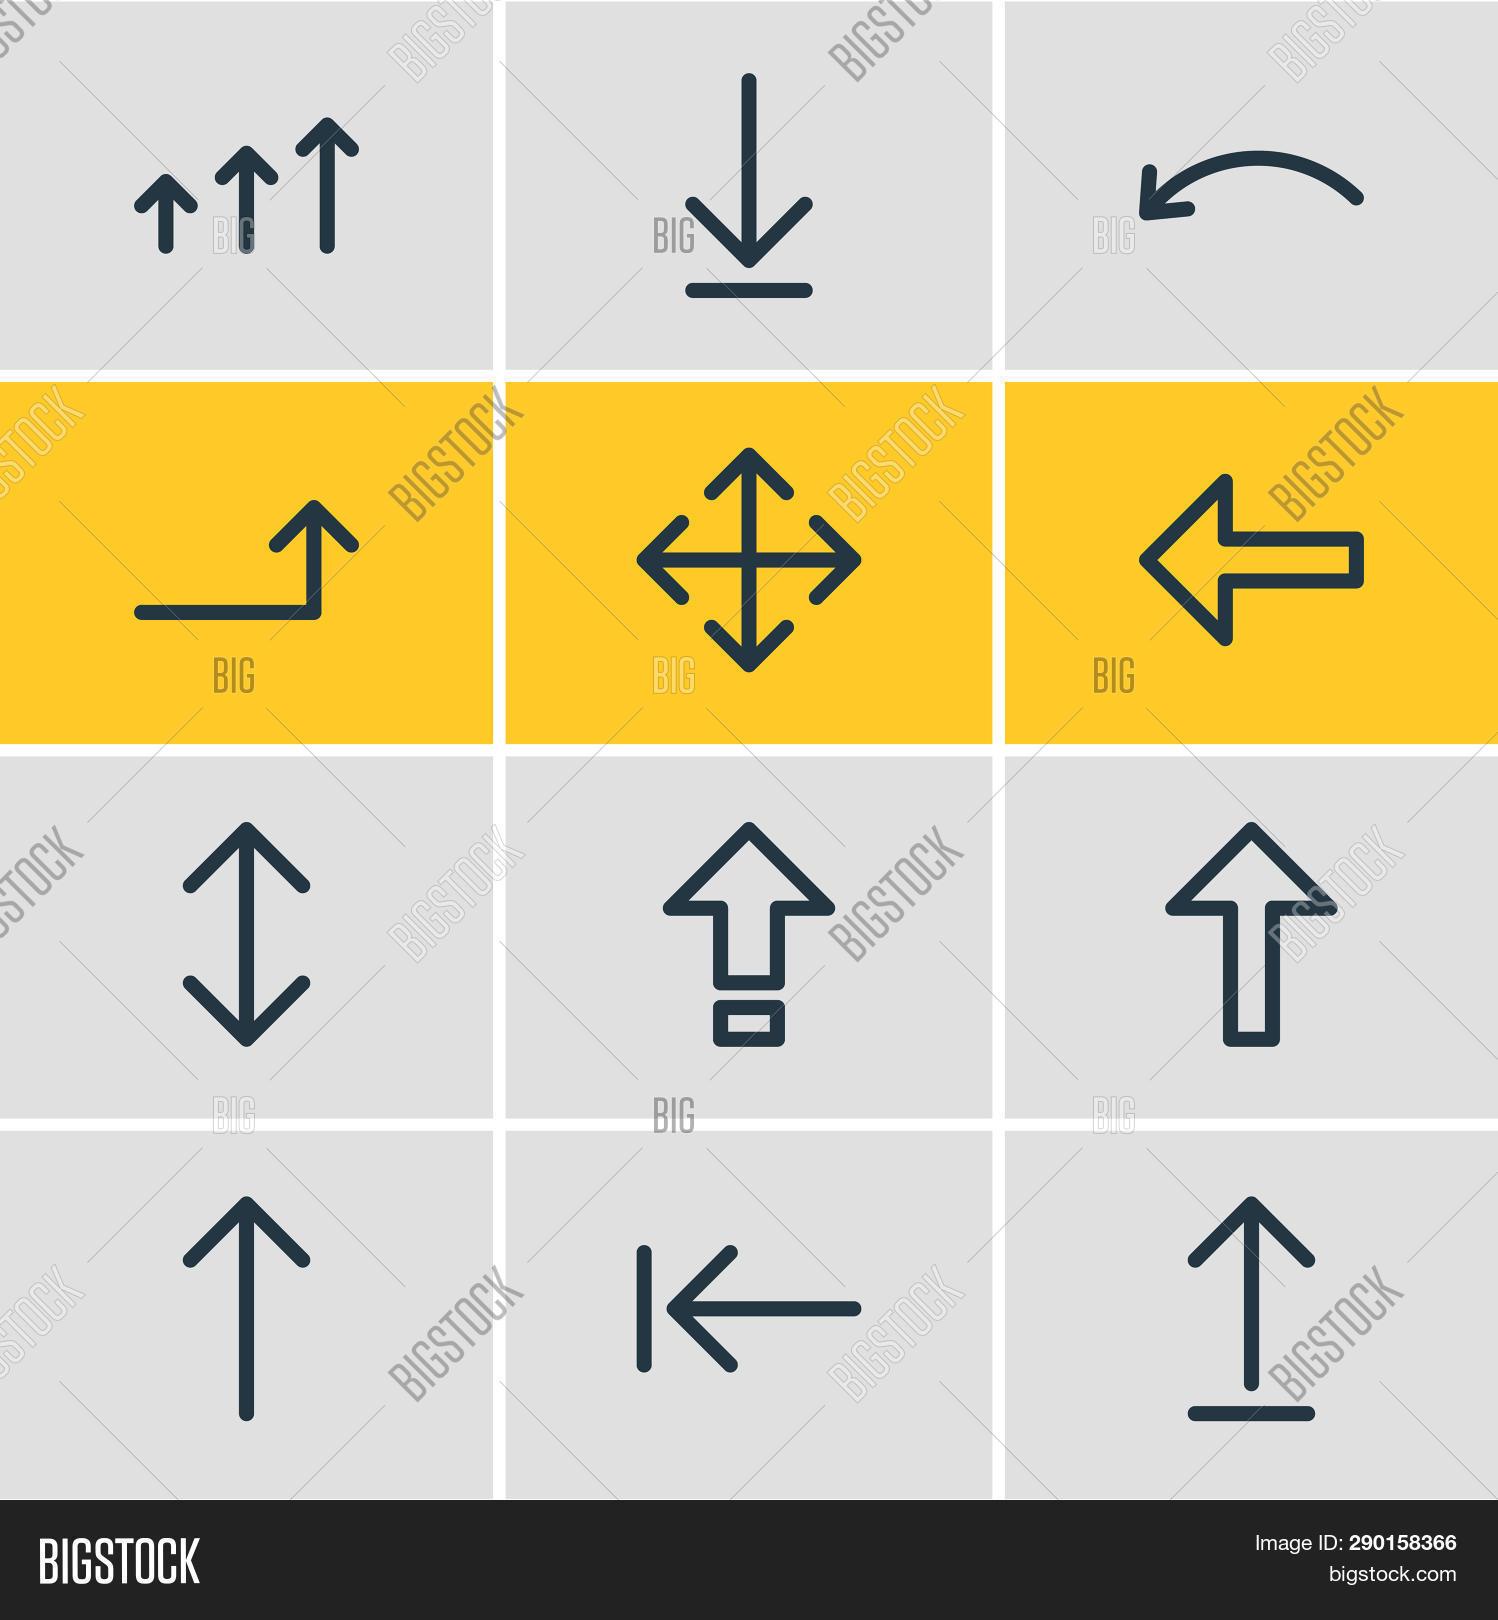 Illustration 12 Arrows Image & Photo (Free Trial) | Bigstock